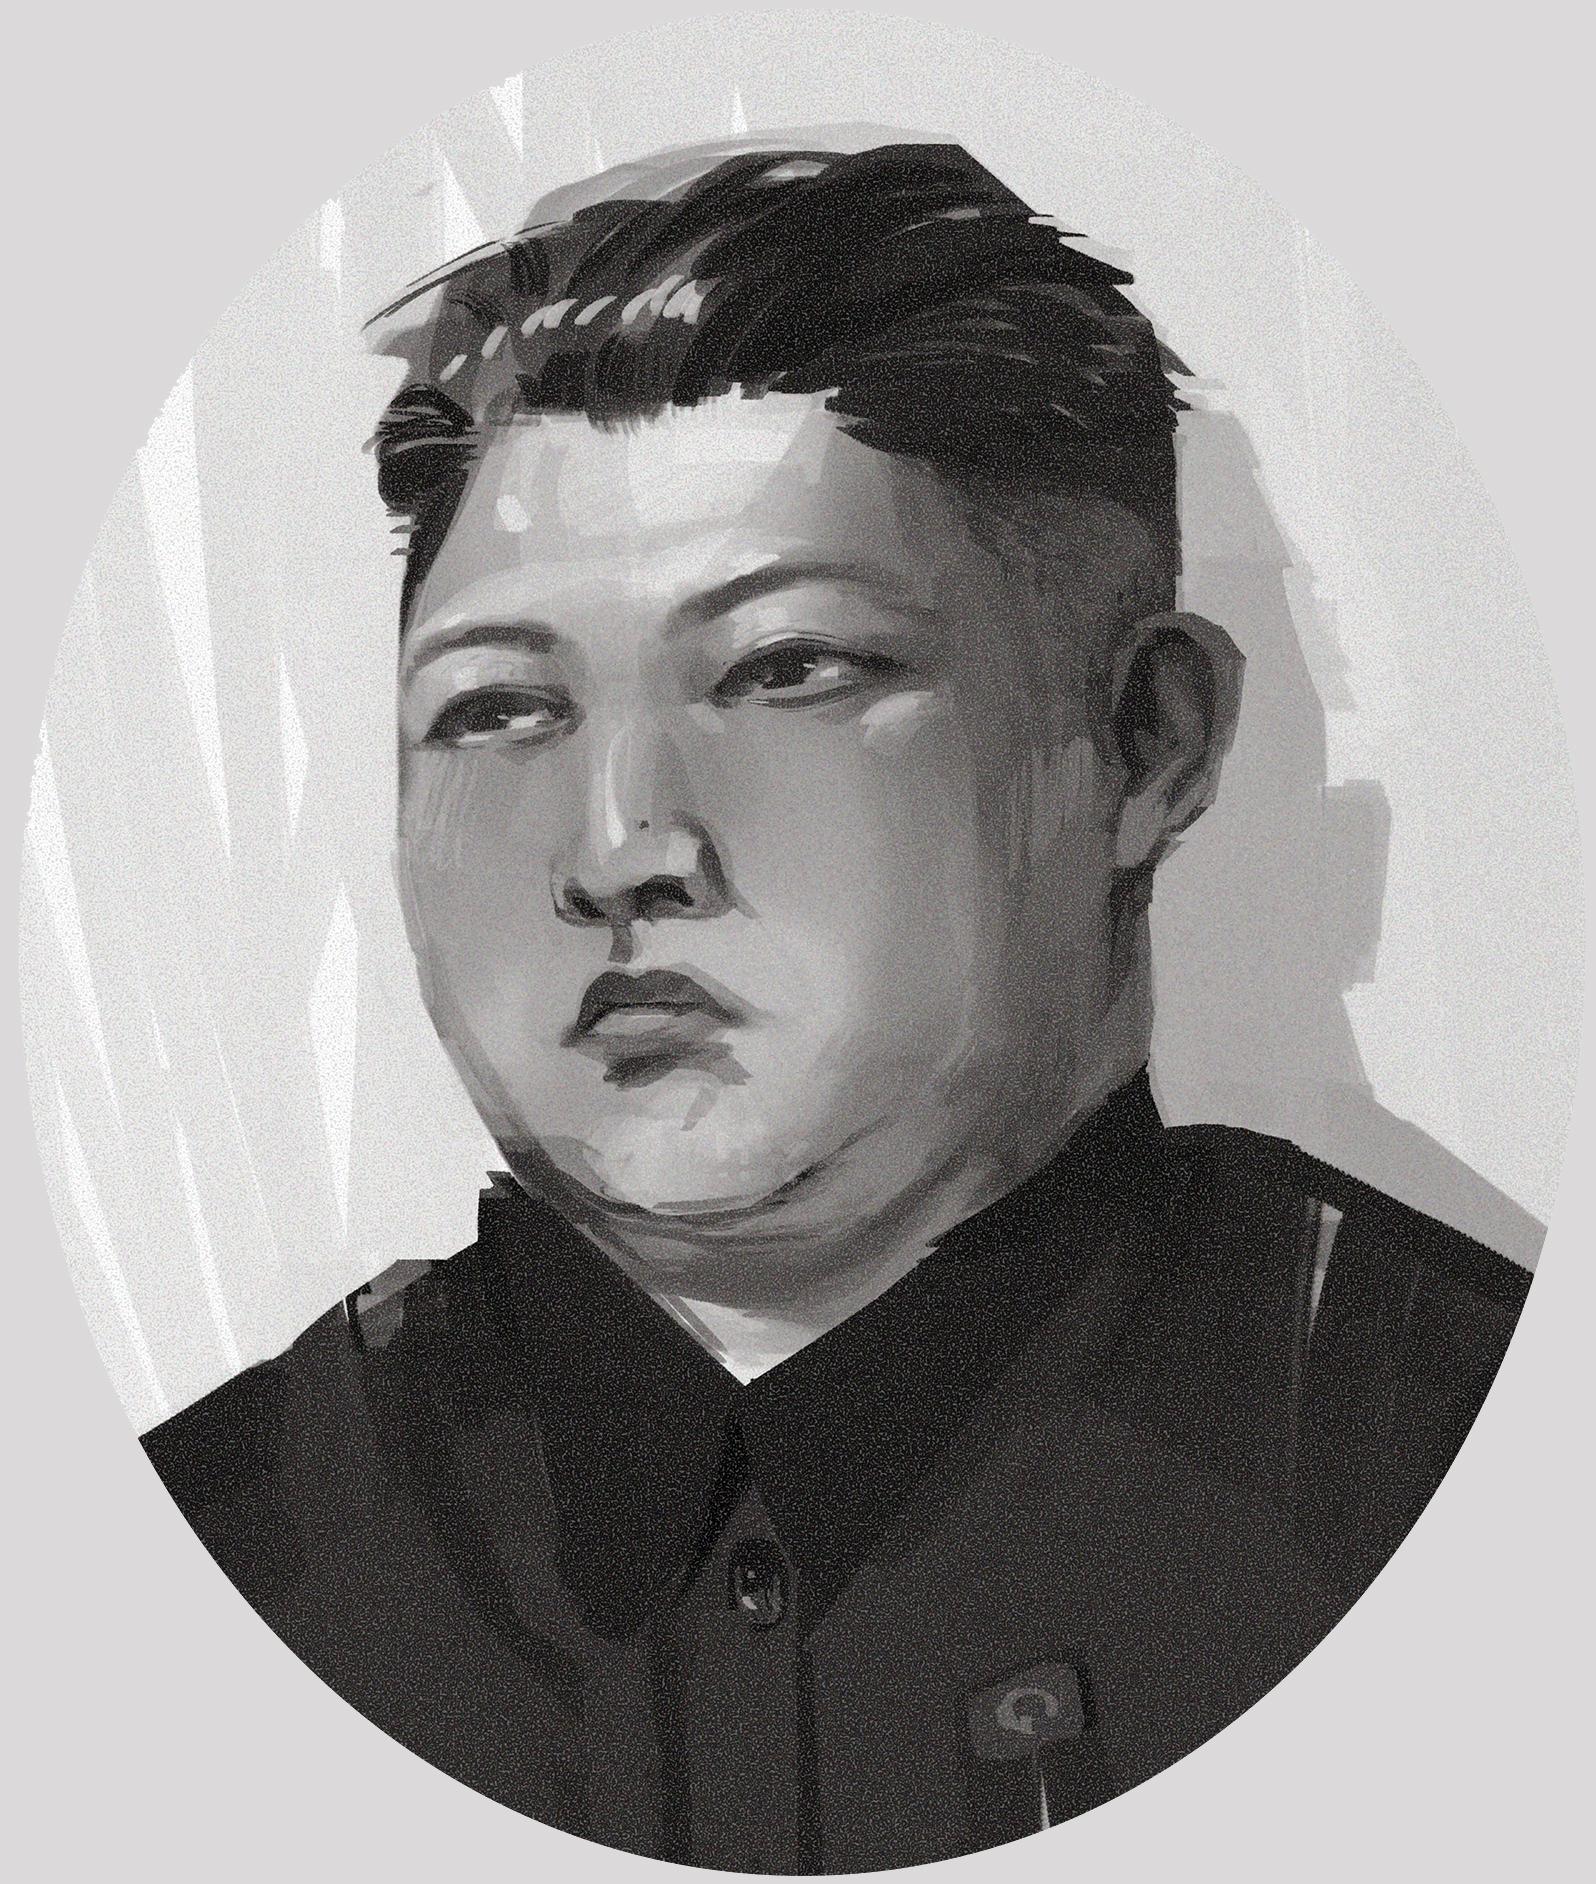 North Korea bans all social media, test fires new missile